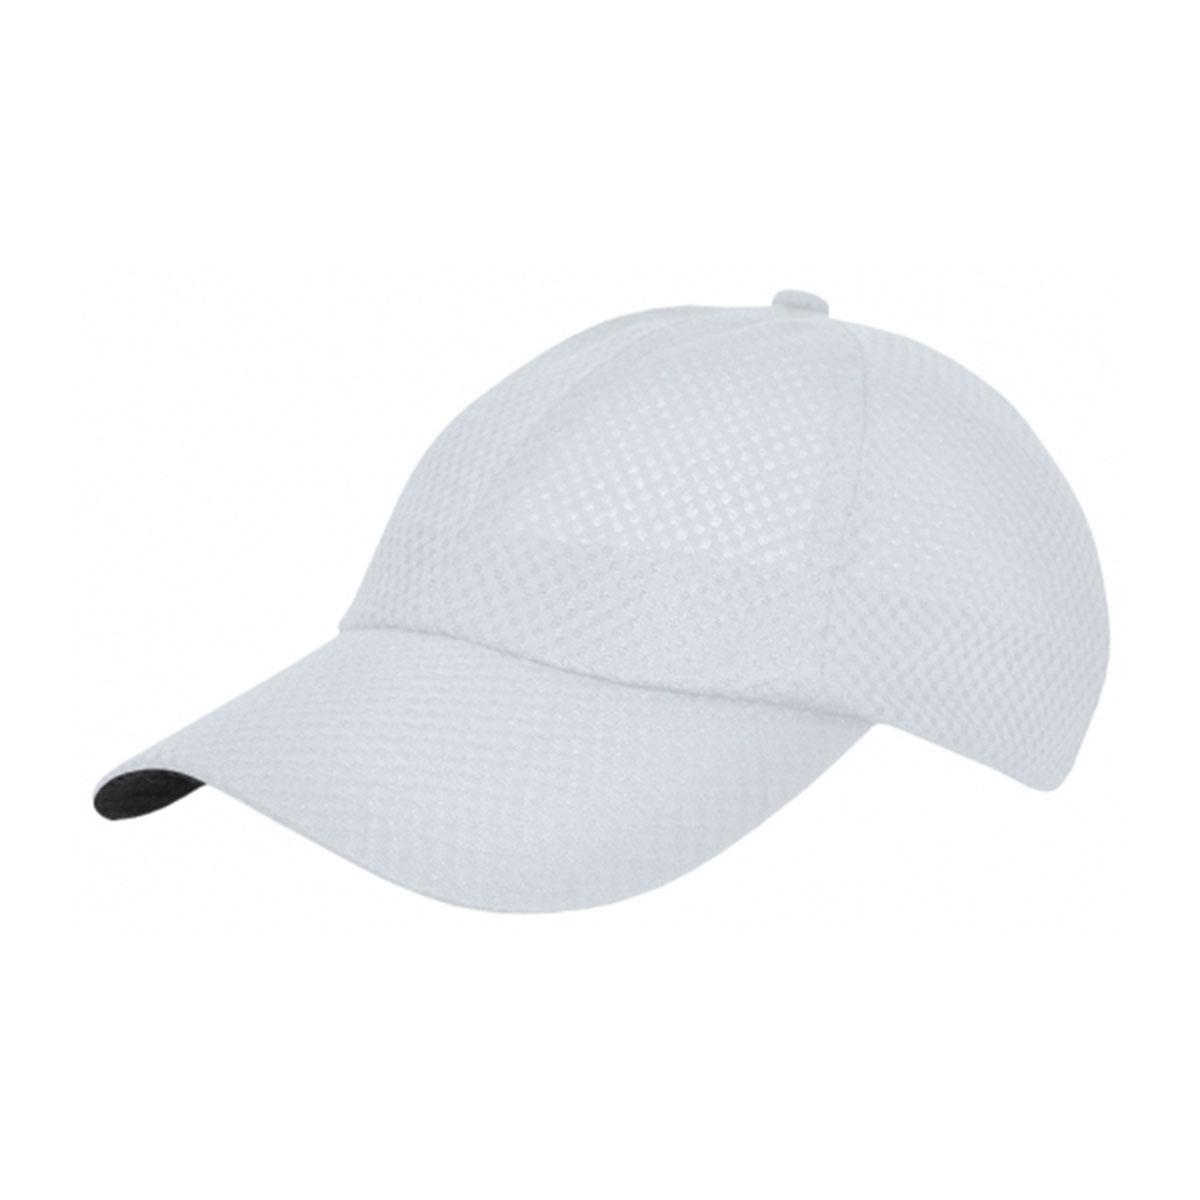 Sports Polymesh Cap-White